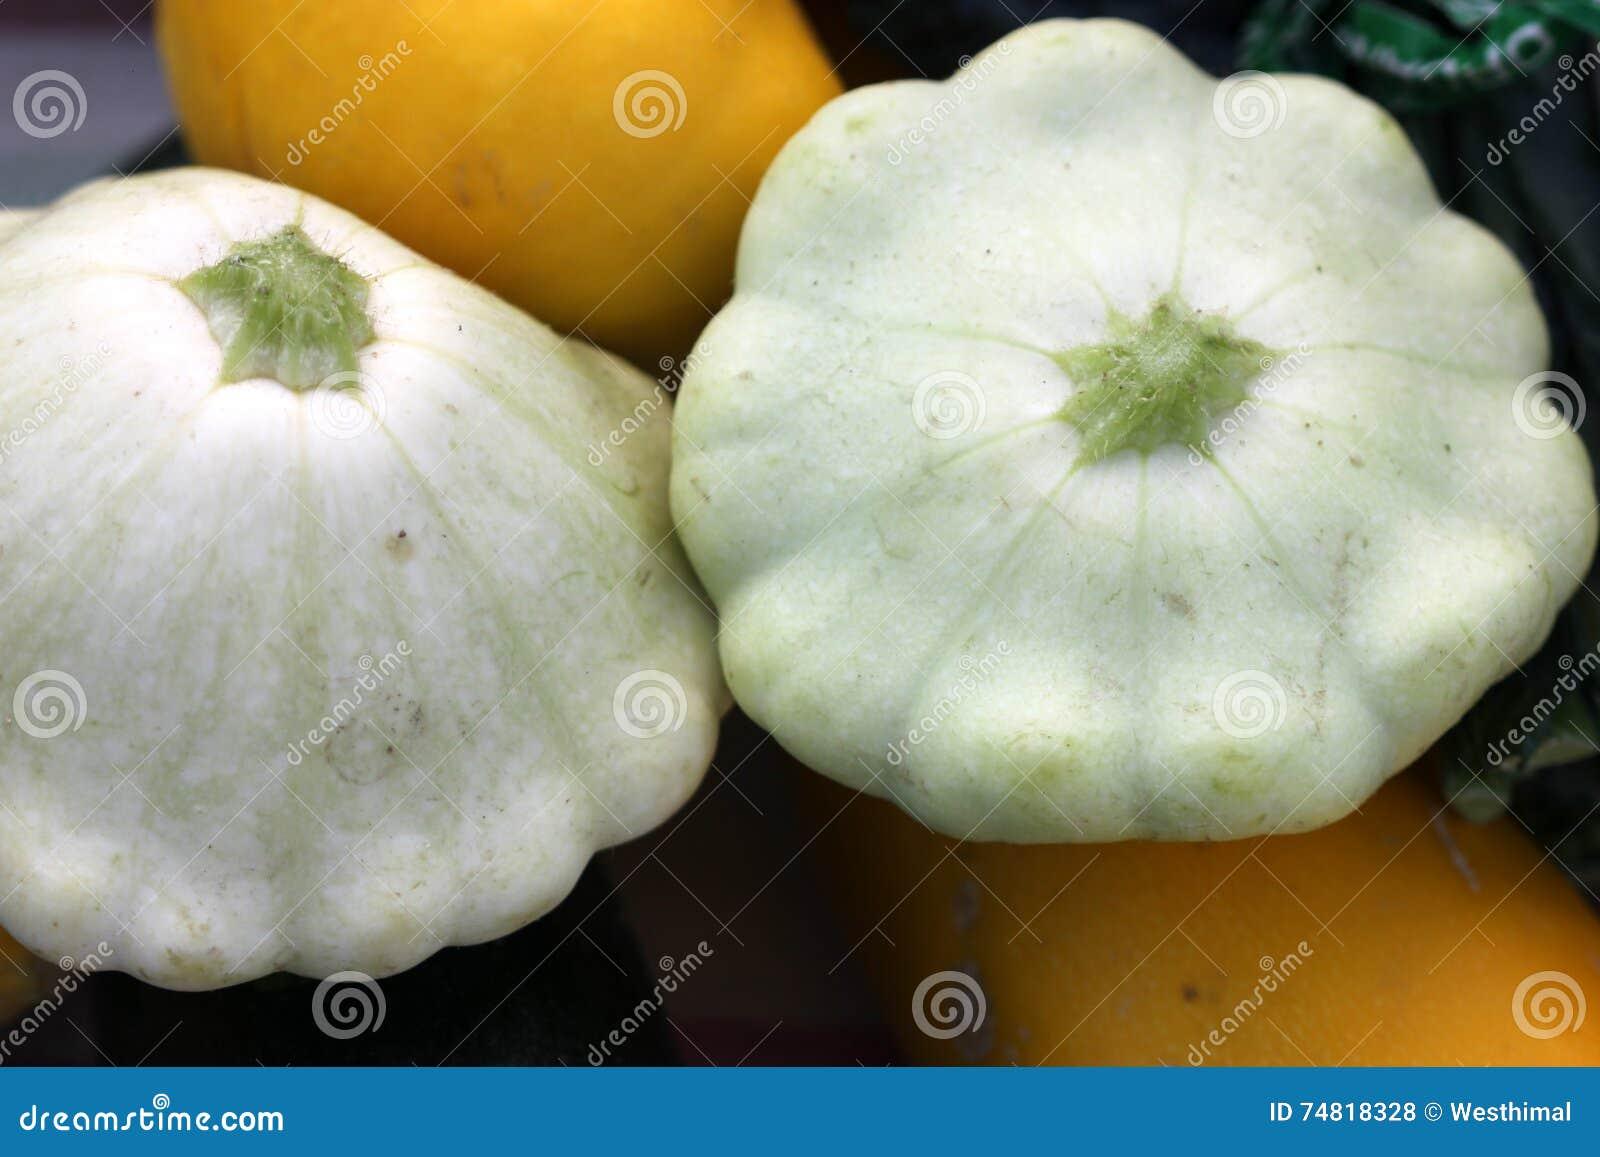 Cucurbita Pepo White Pattypan Squash Stock Photo Image of green